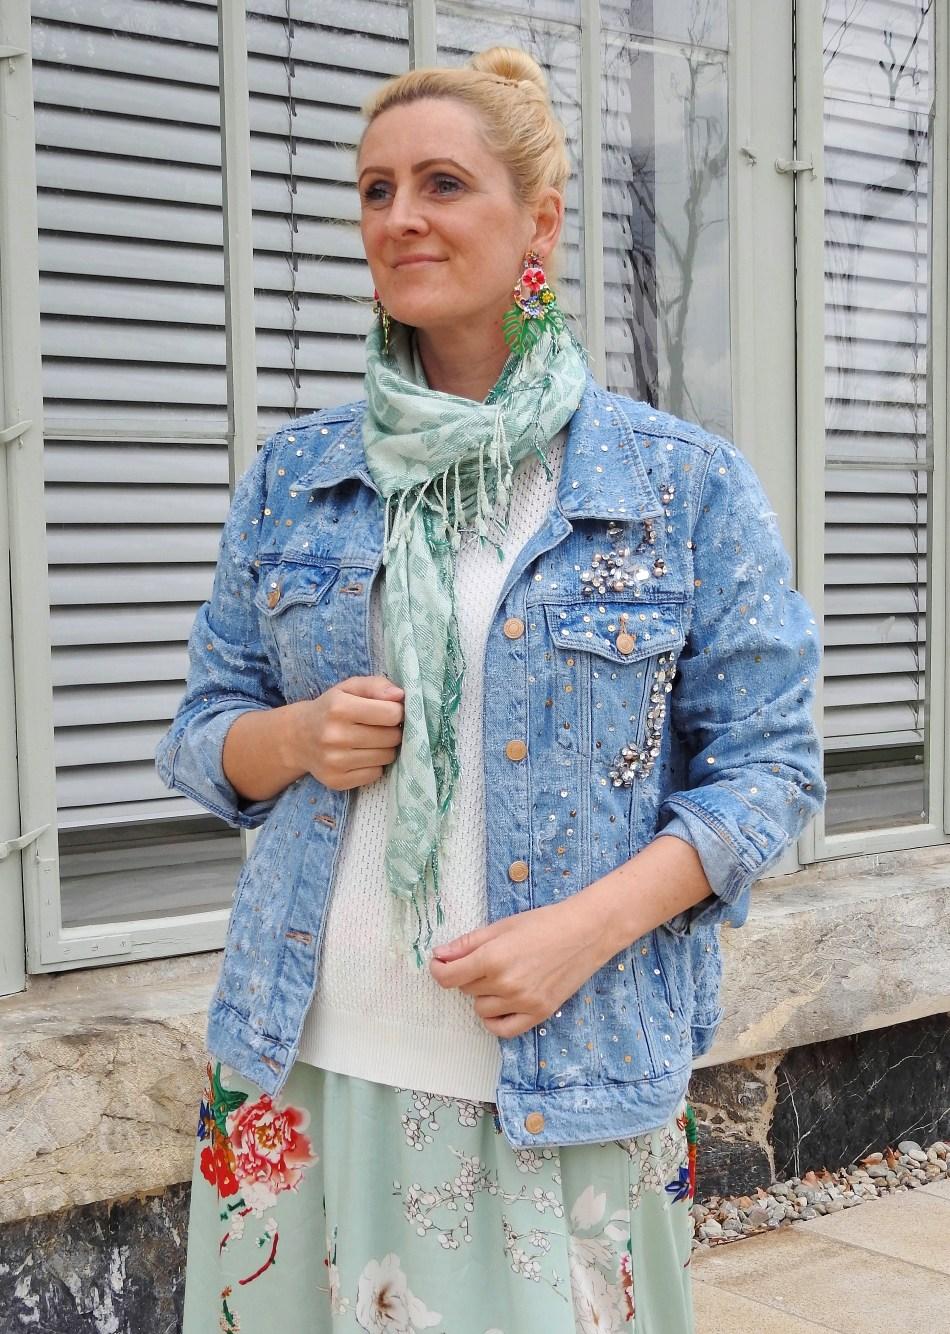 Blumenprint-Esprit-Kirschblüten-Carrera-Sunglasses-Floralprint-Converse-Springvibes-Springlook-Tamara-Prutsch